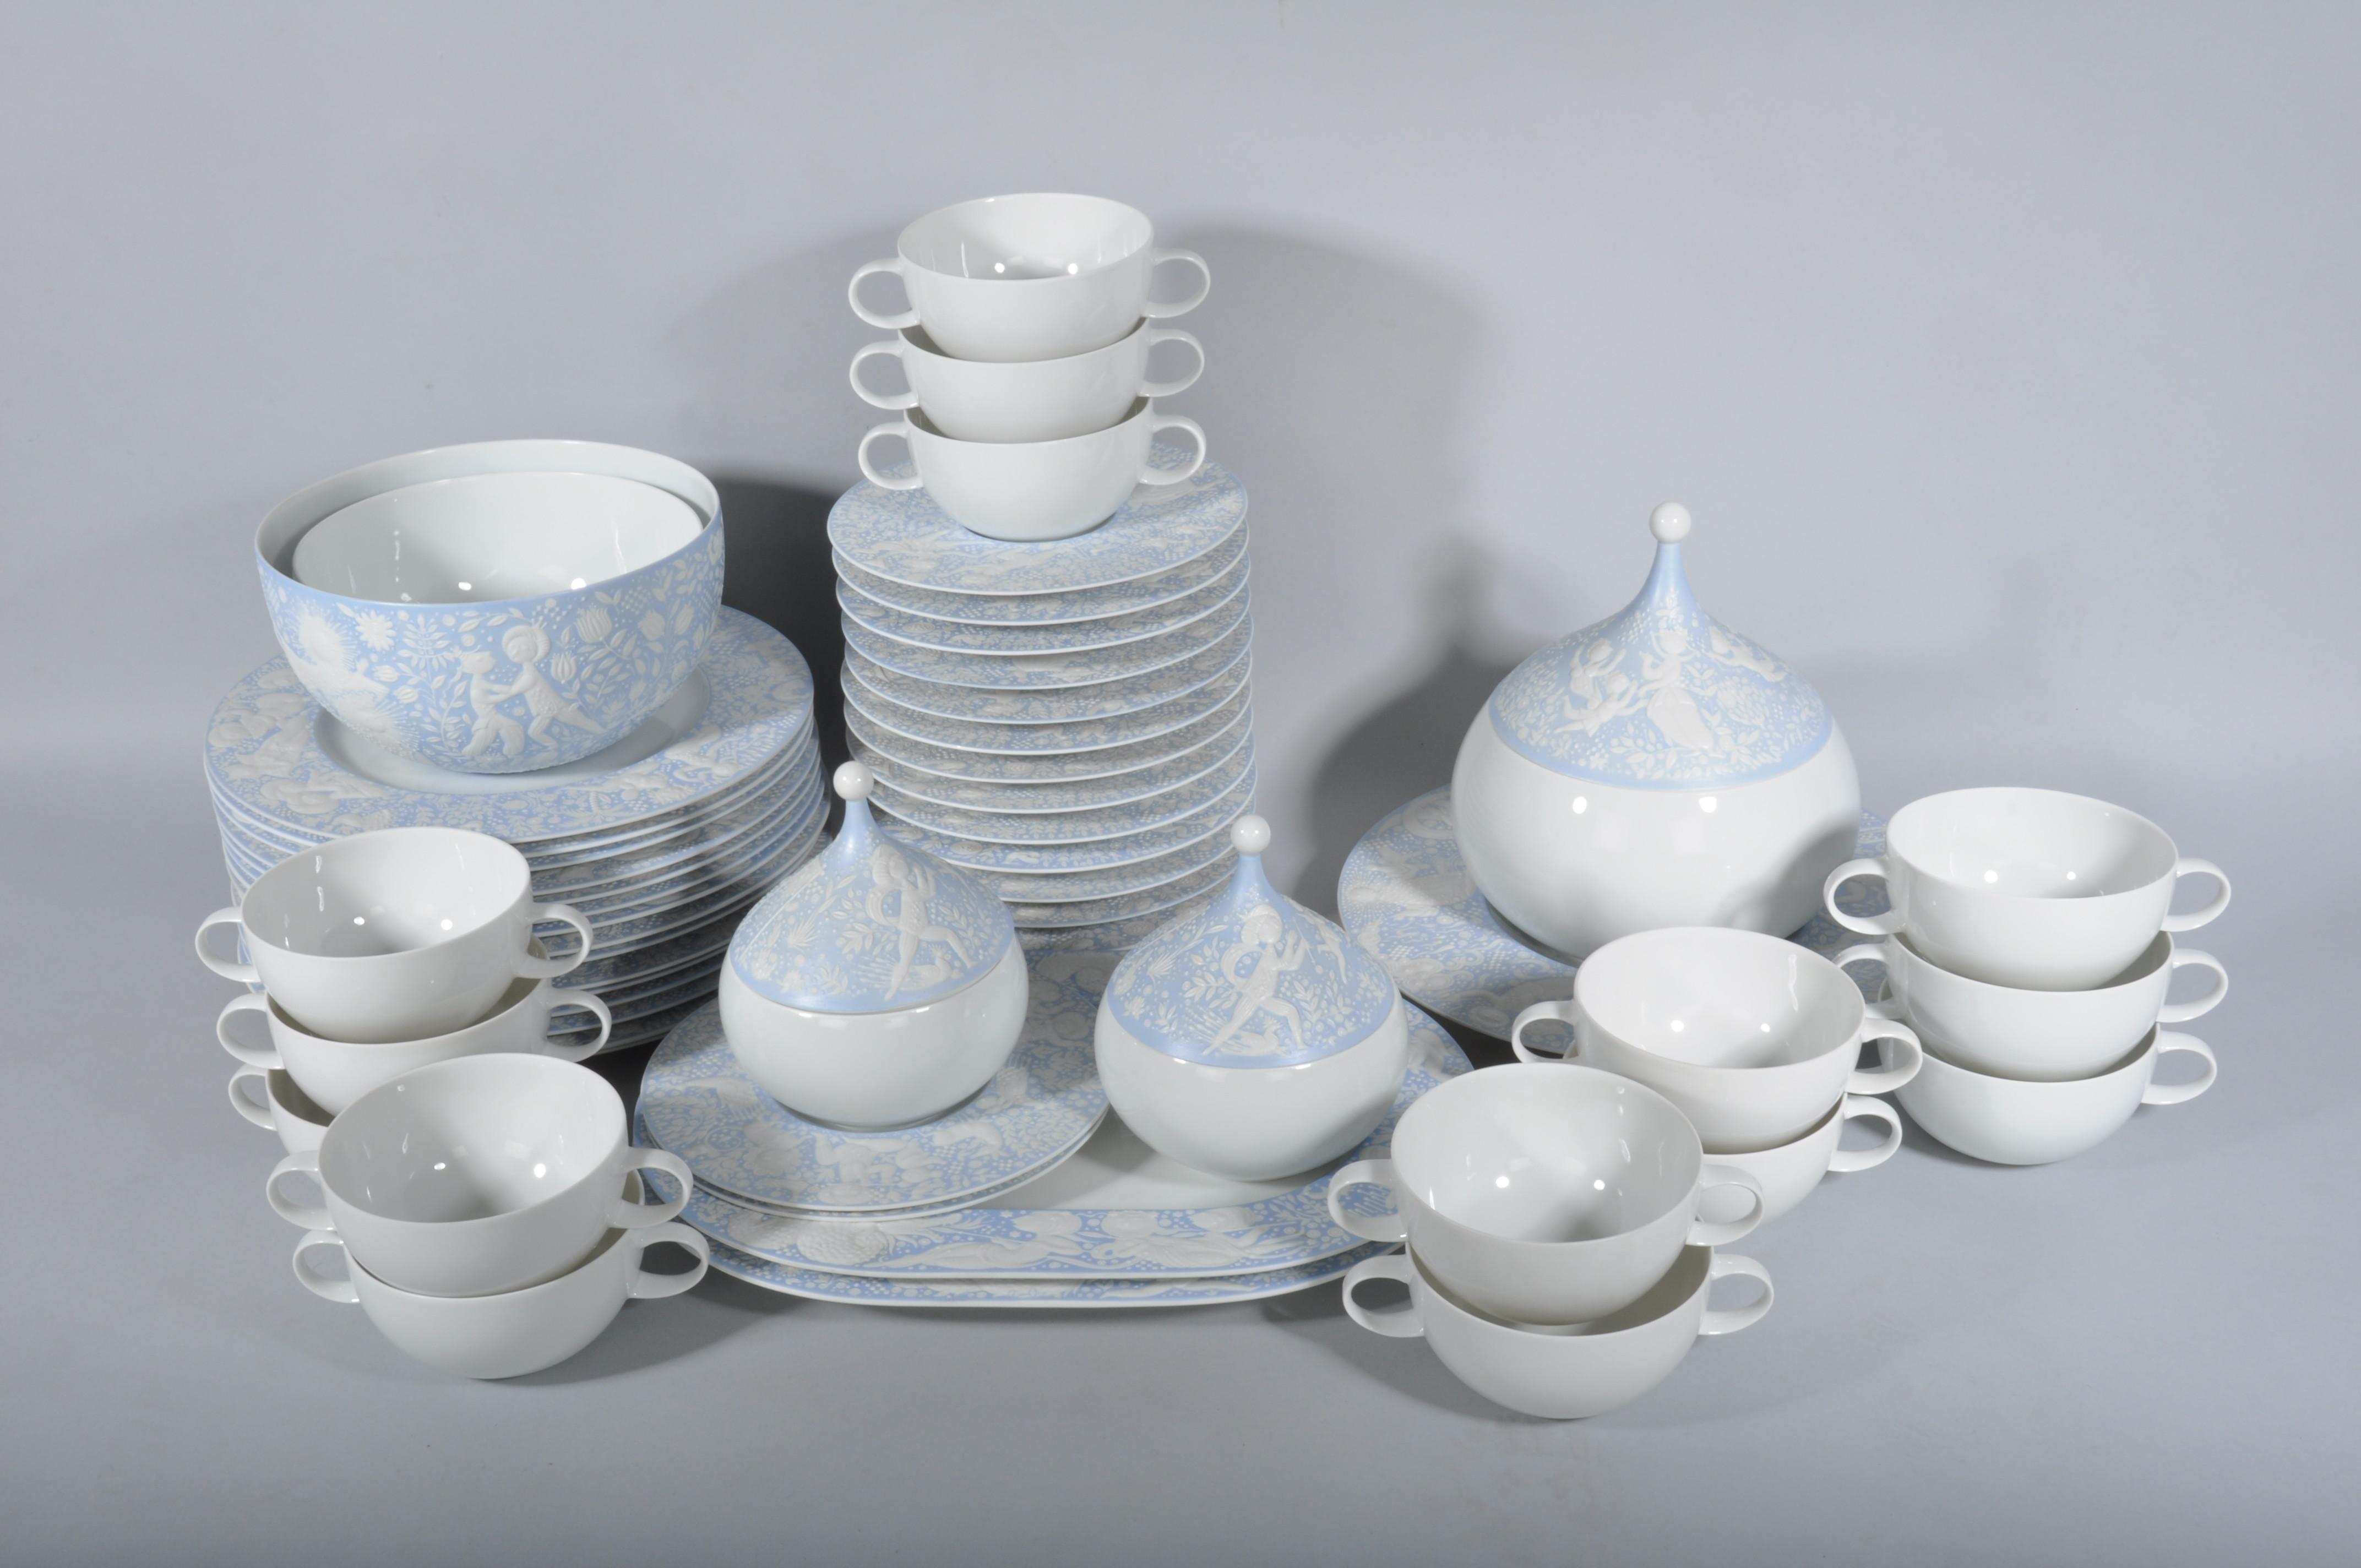 Rosenthal Bjorn Wiinblad Zauberflote Pamina Speiseservice Fur 15 Personen Keramik Porzellan Europaisch Auctionet